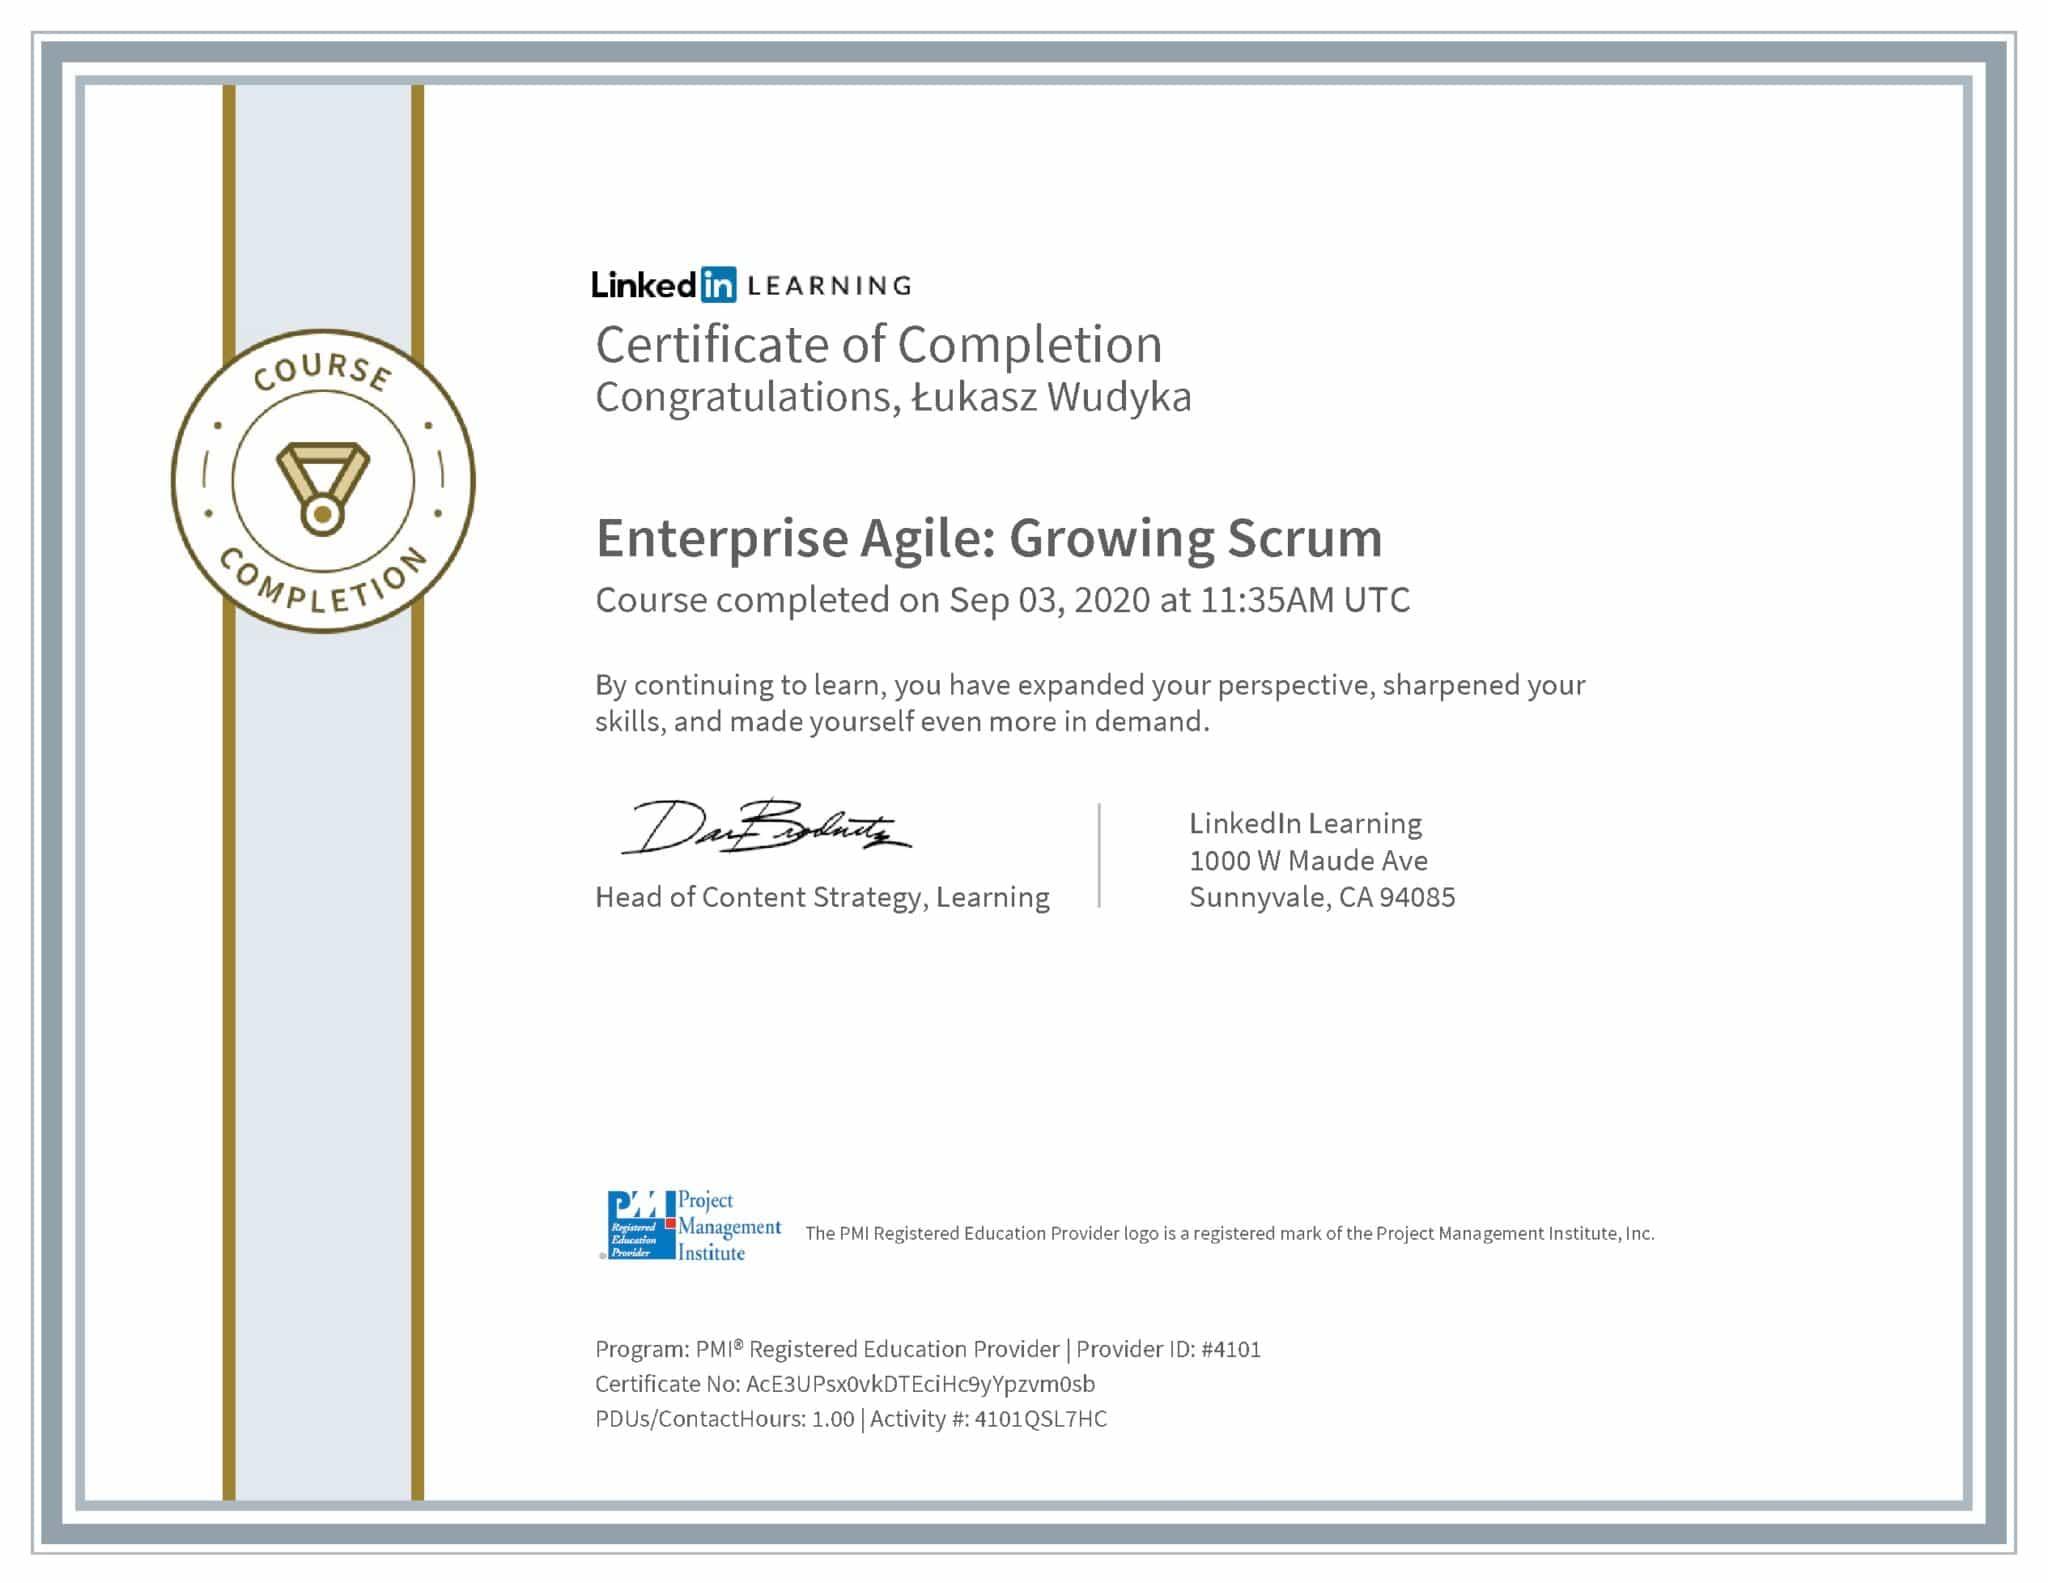 Łukasz Wudyka certyfikat LinkedIn Enterprise Agile: Growing Scrum PMI